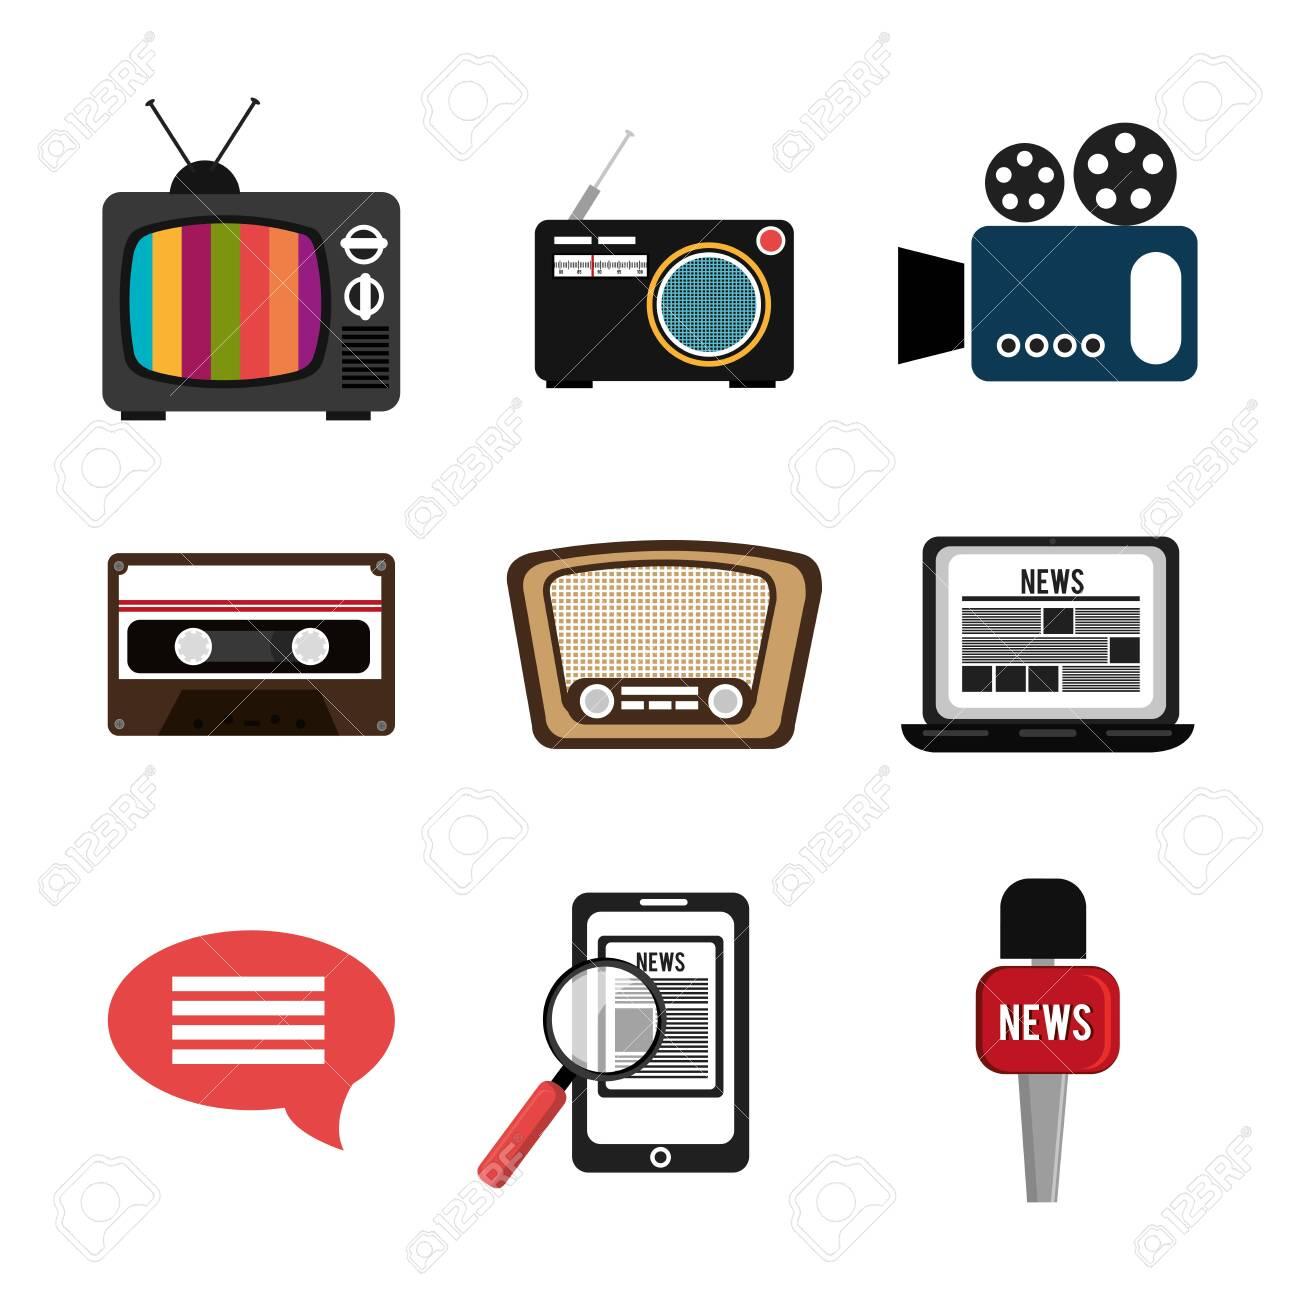 set of news information icons vector illustration design - 145077794